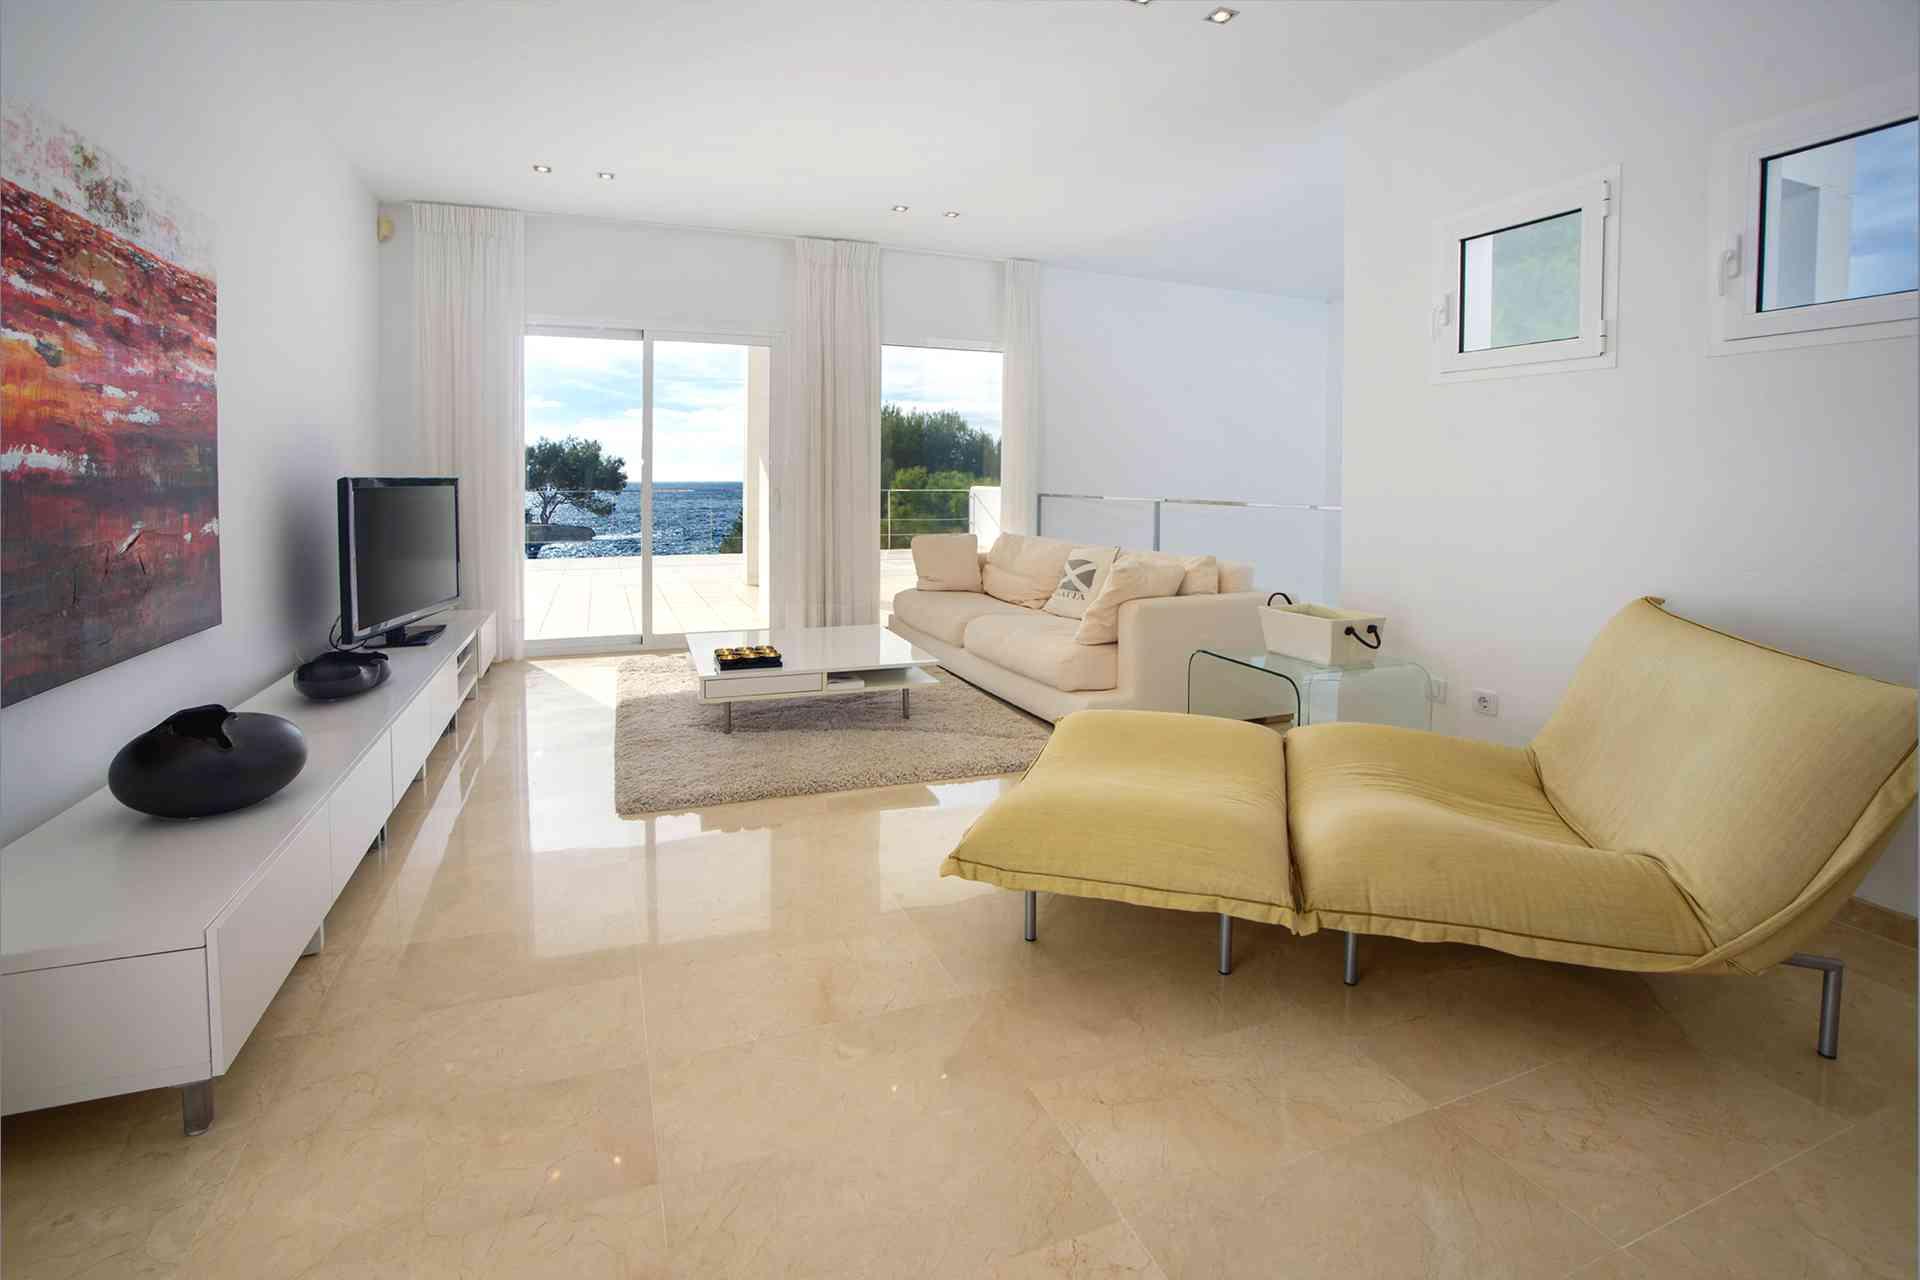 01-156 moderne Meerblick Villa Mallorca Osten Bild 22